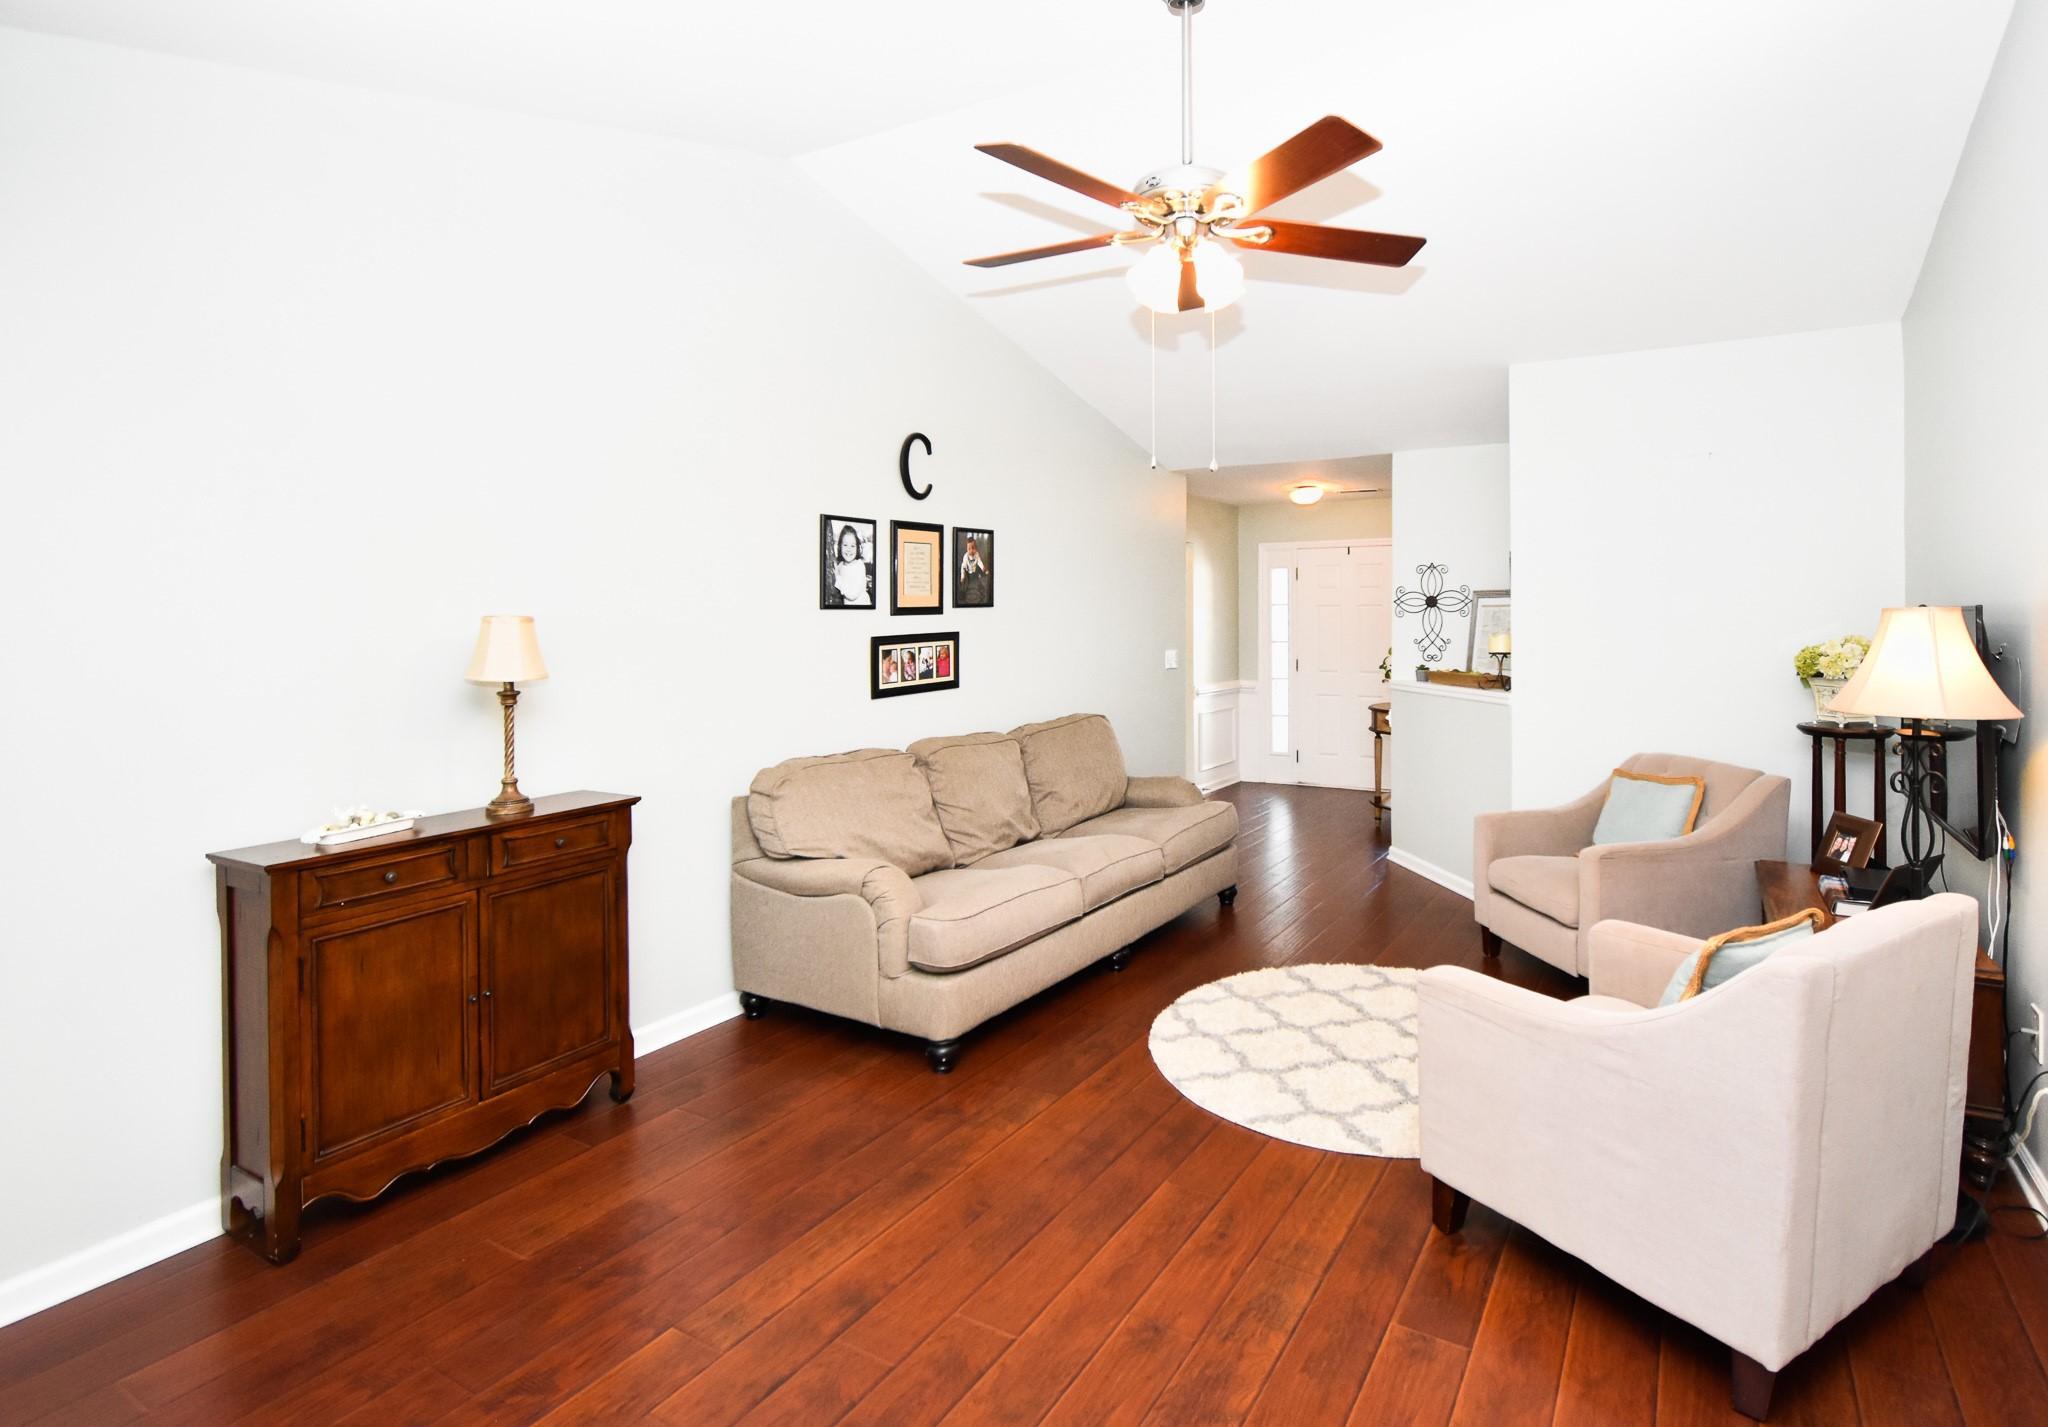 Park West Homes For Sale - 1444 Wellesley, Mount Pleasant, SC - 6